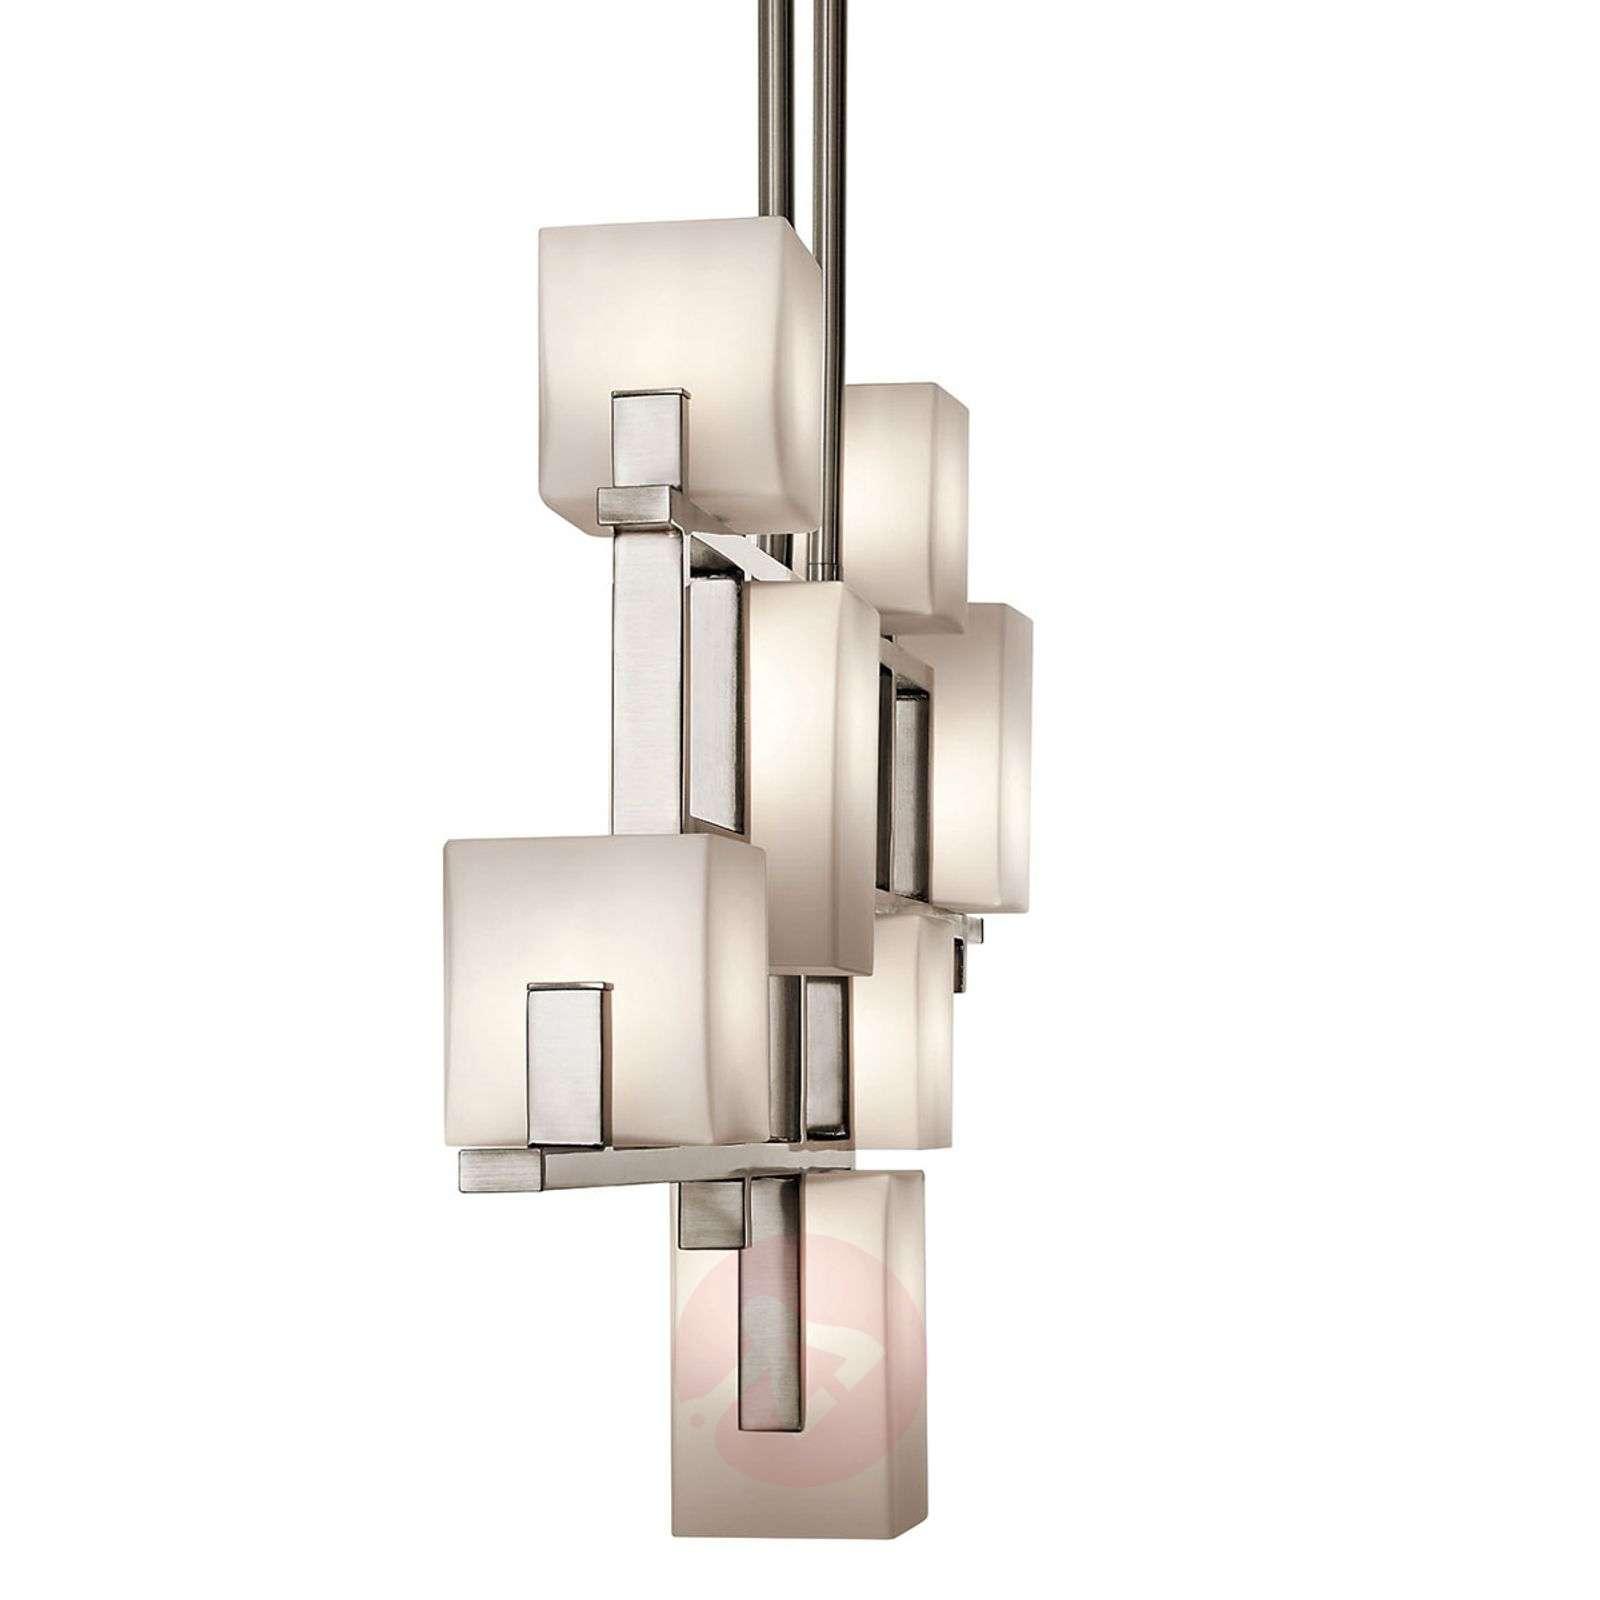 Modernisti muotoiltu City Lights-riippuvalaisin-3048285-01